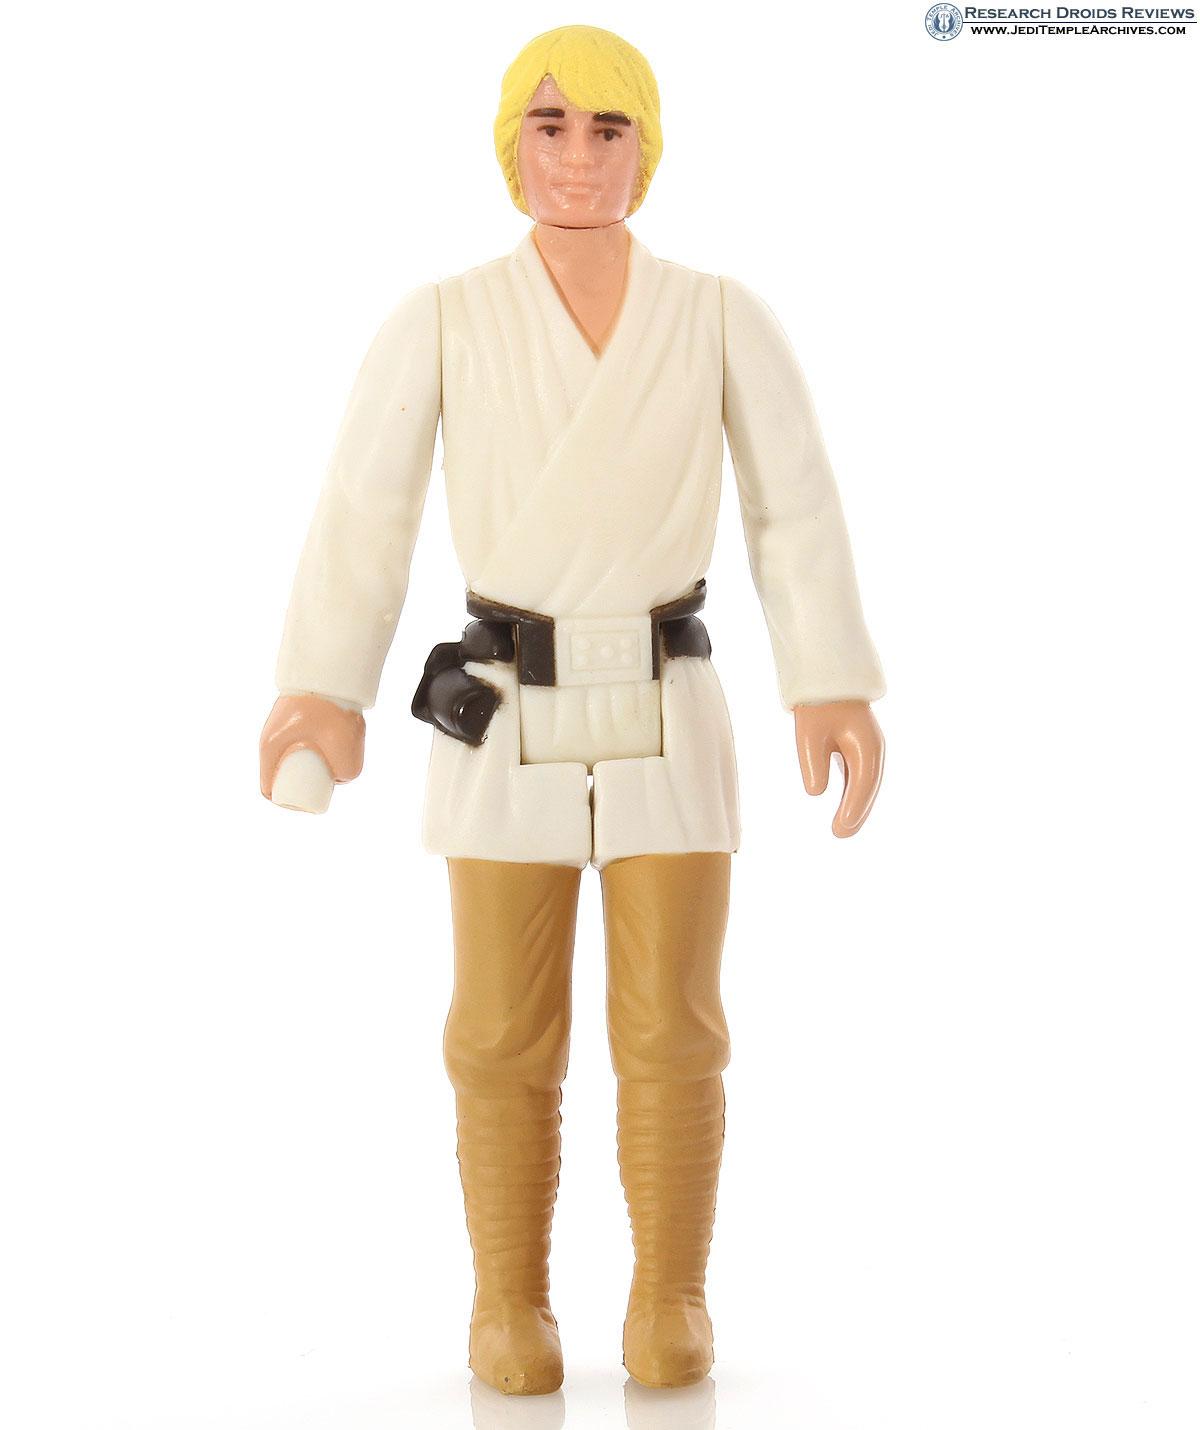 Luke Skywalker | Classic Edition 4-Pack